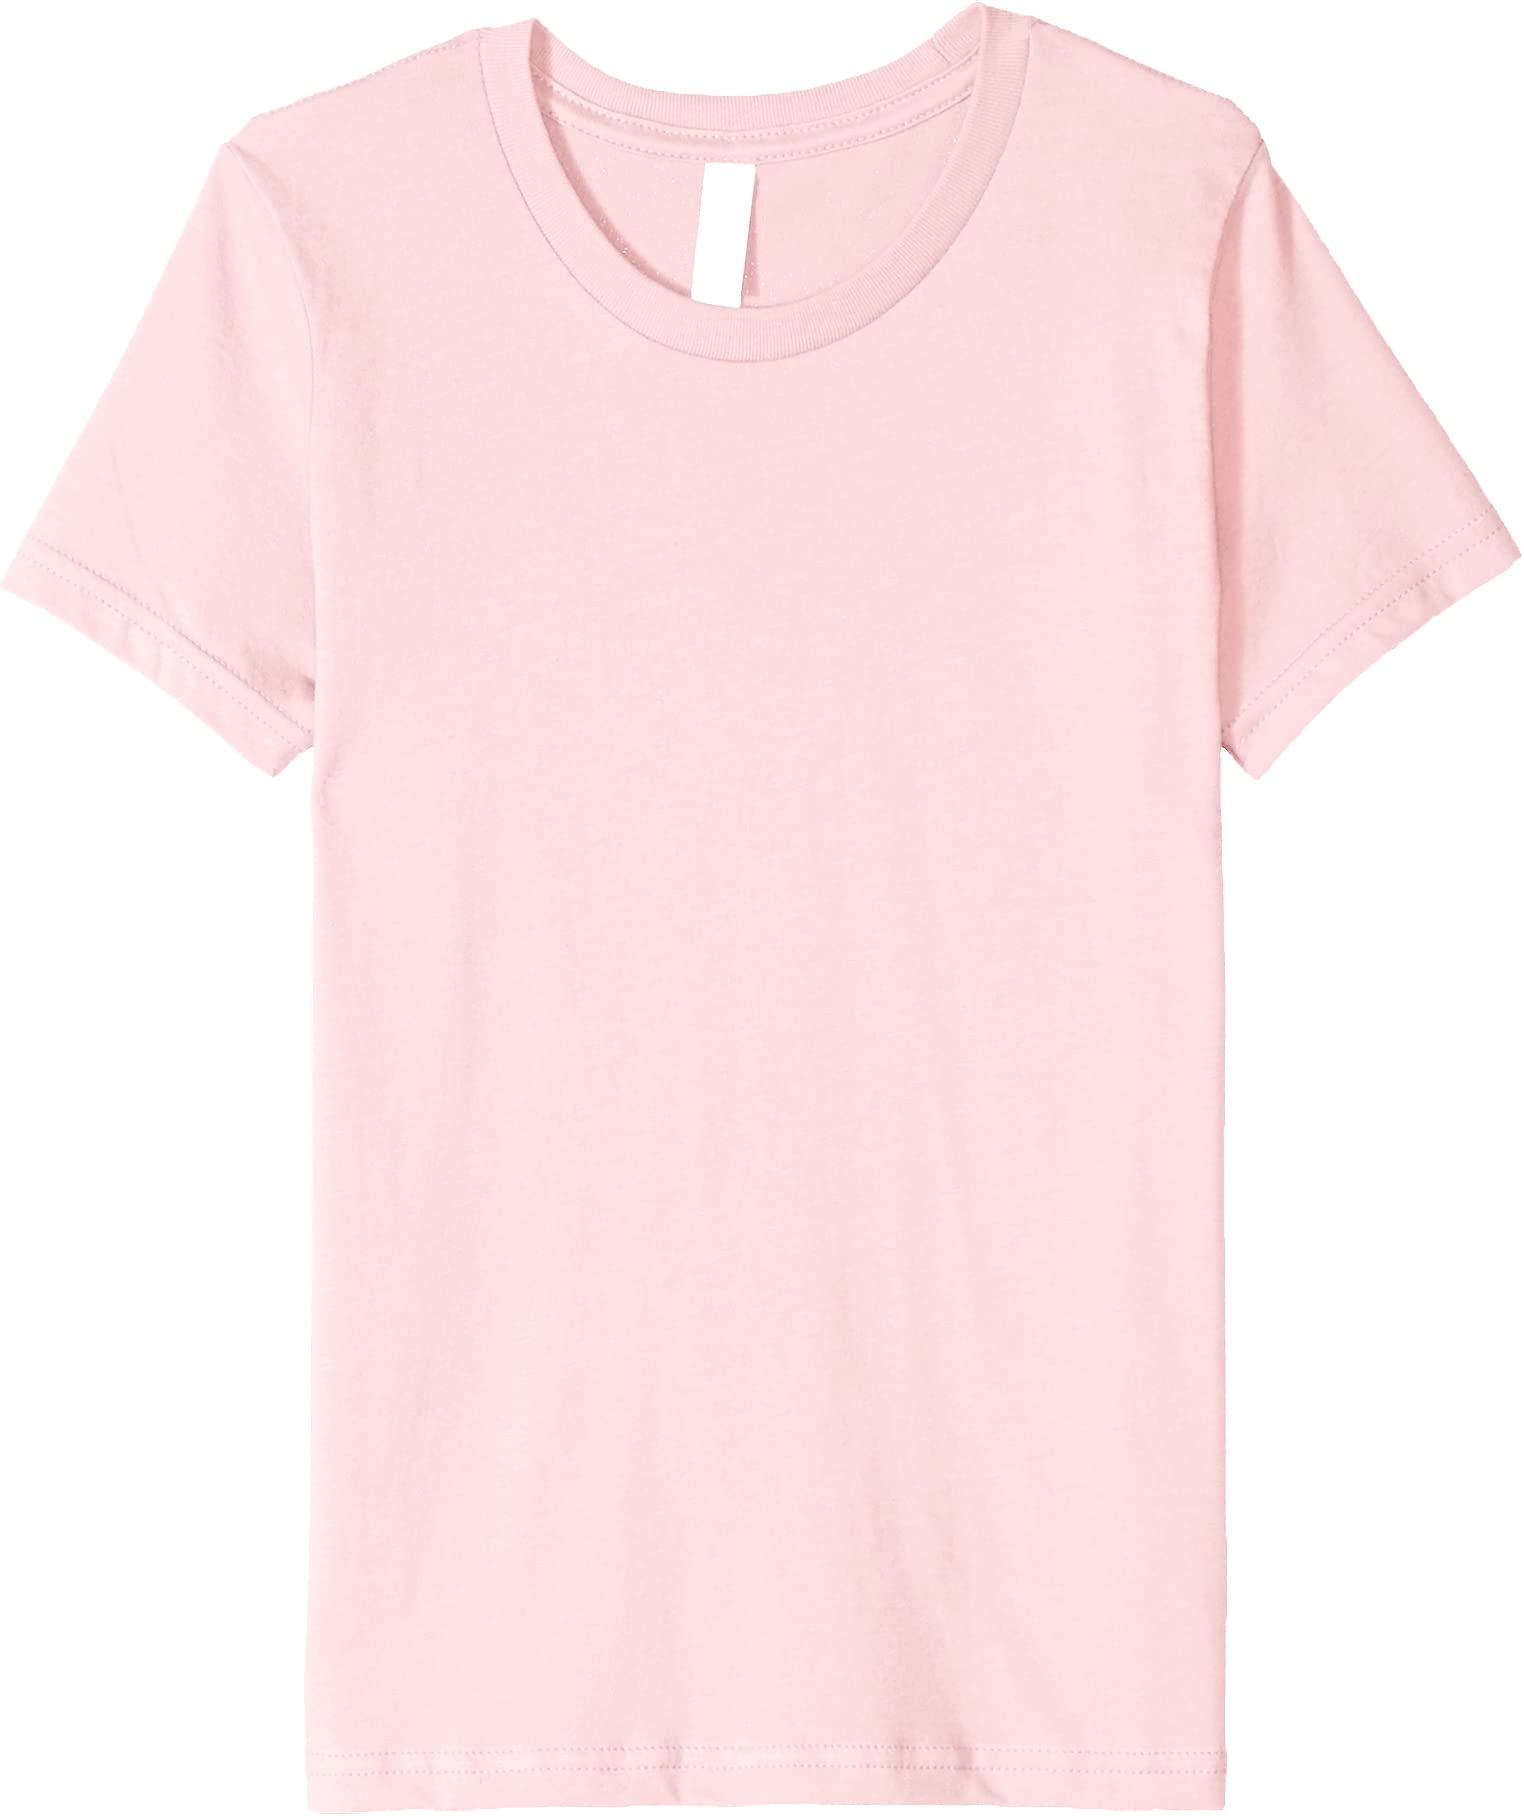 Mermaid Boys and Girls All Over Print T-Shirt,Crew Neck T-Shirt,Hand Drawn Merma